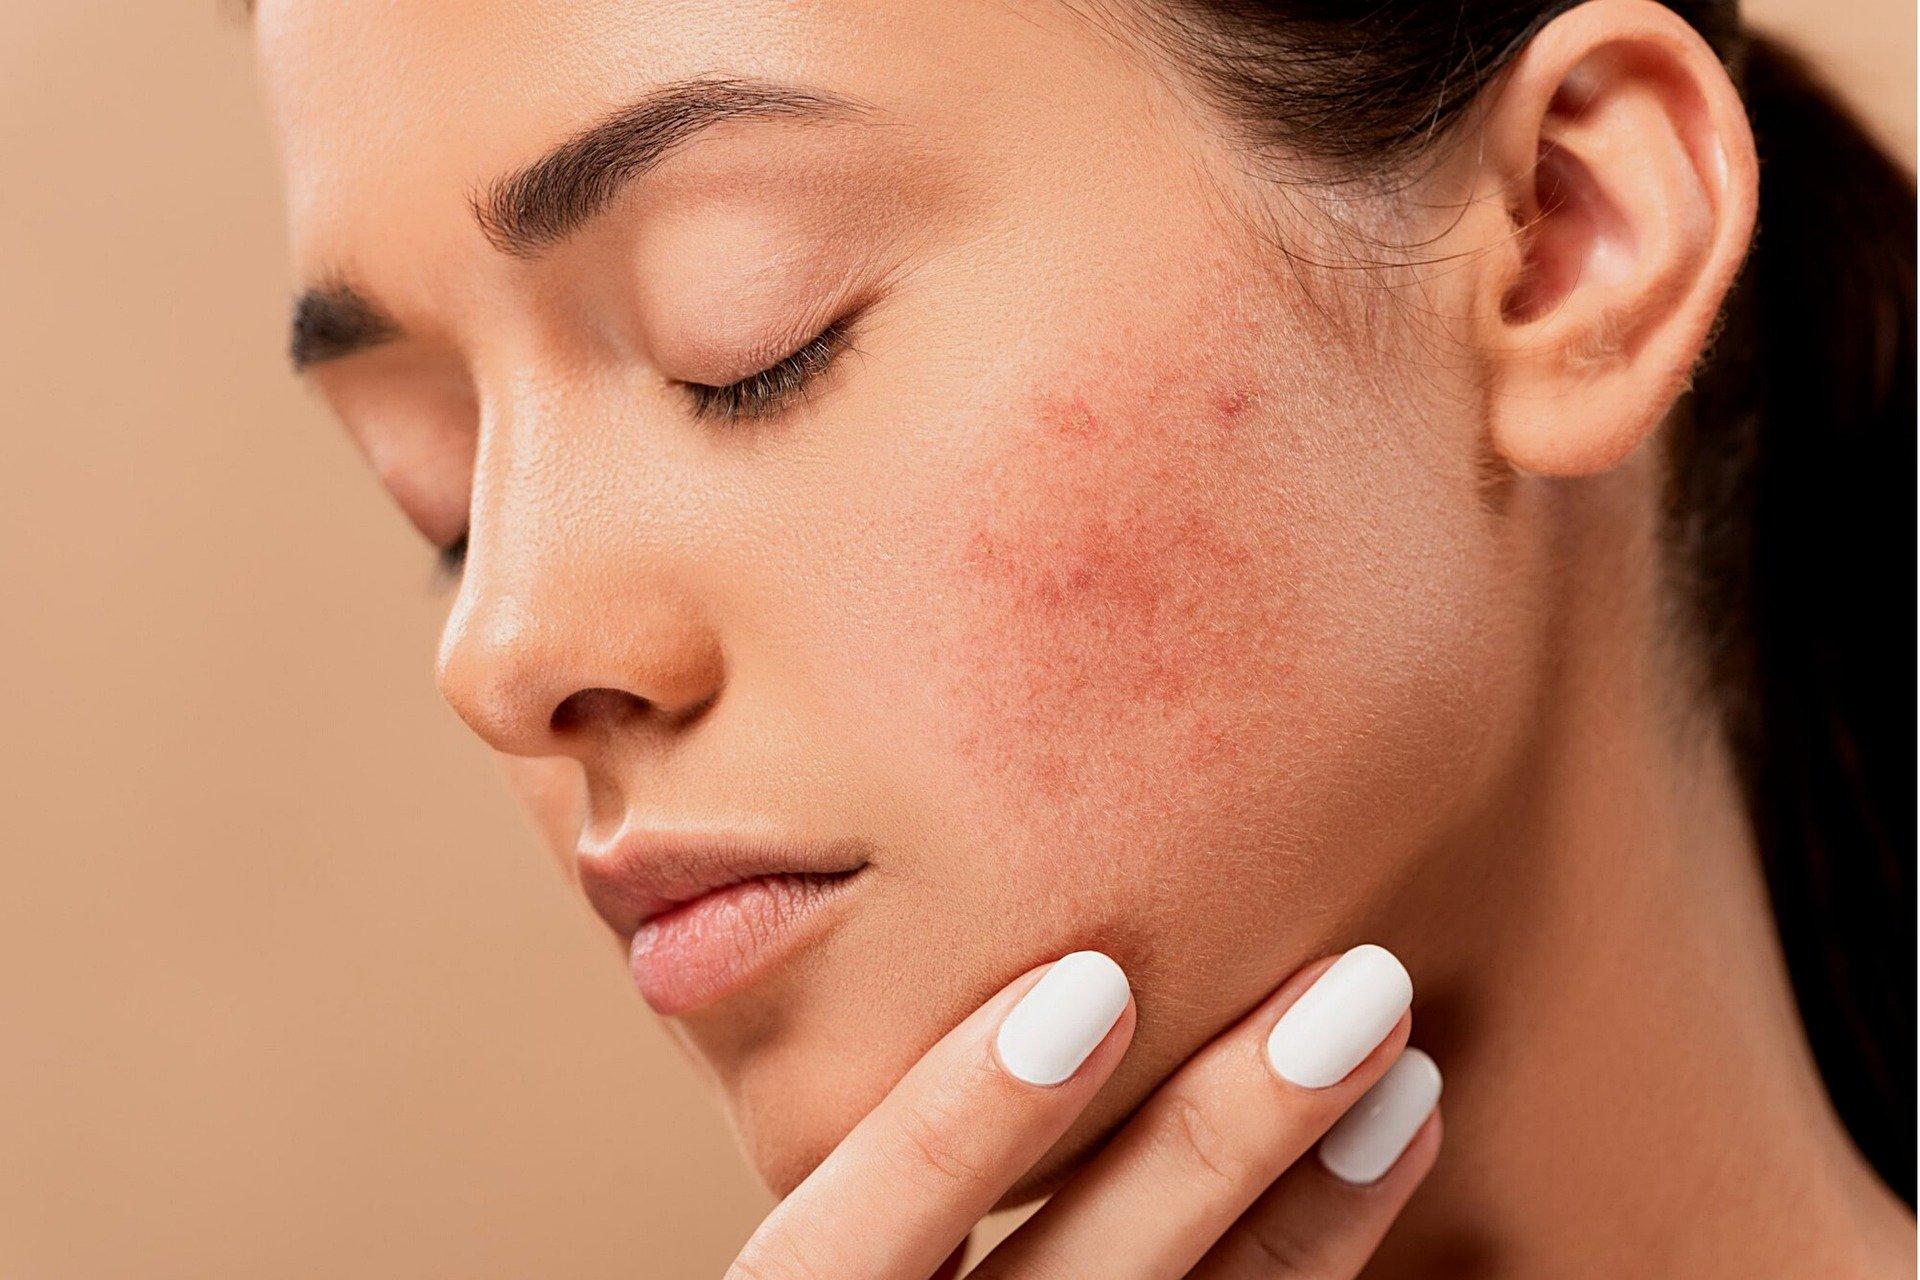 acne-5561750_1920